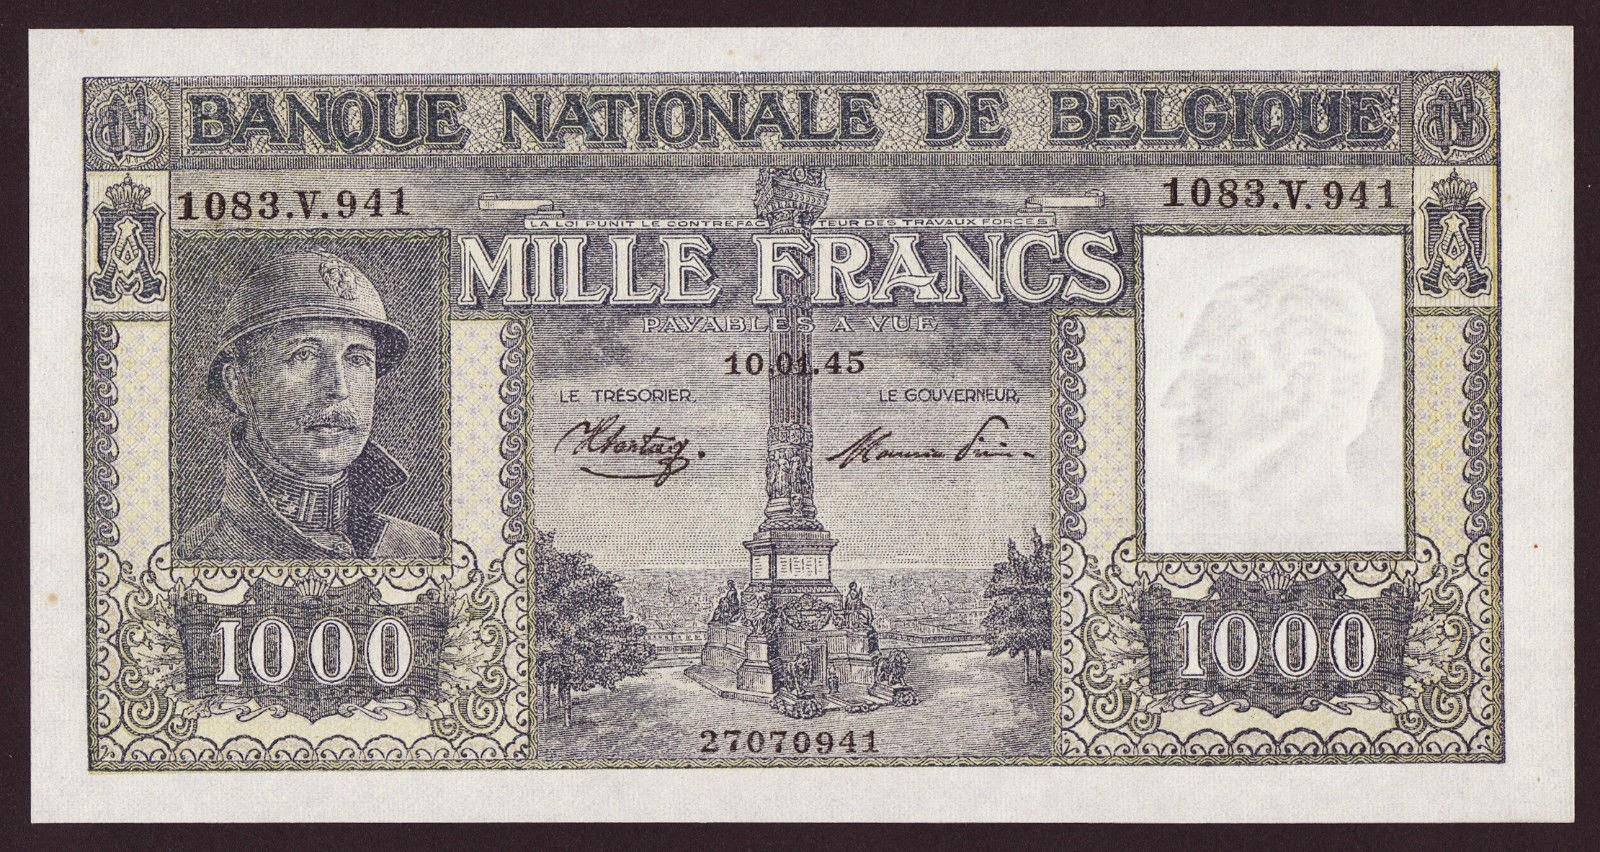 Belgium Banknotes 1000 Francs banknote 1945 King Albert I Adrian helmet and military uniform